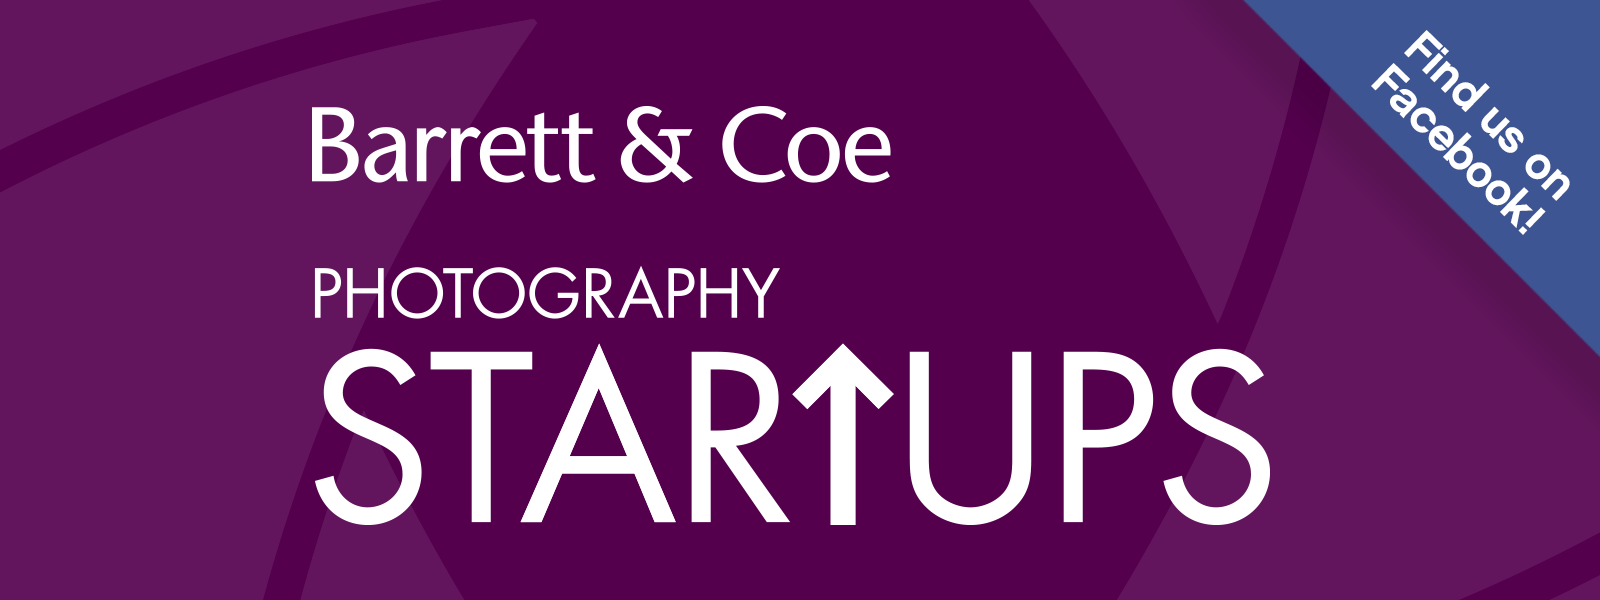 Startups-banner-web